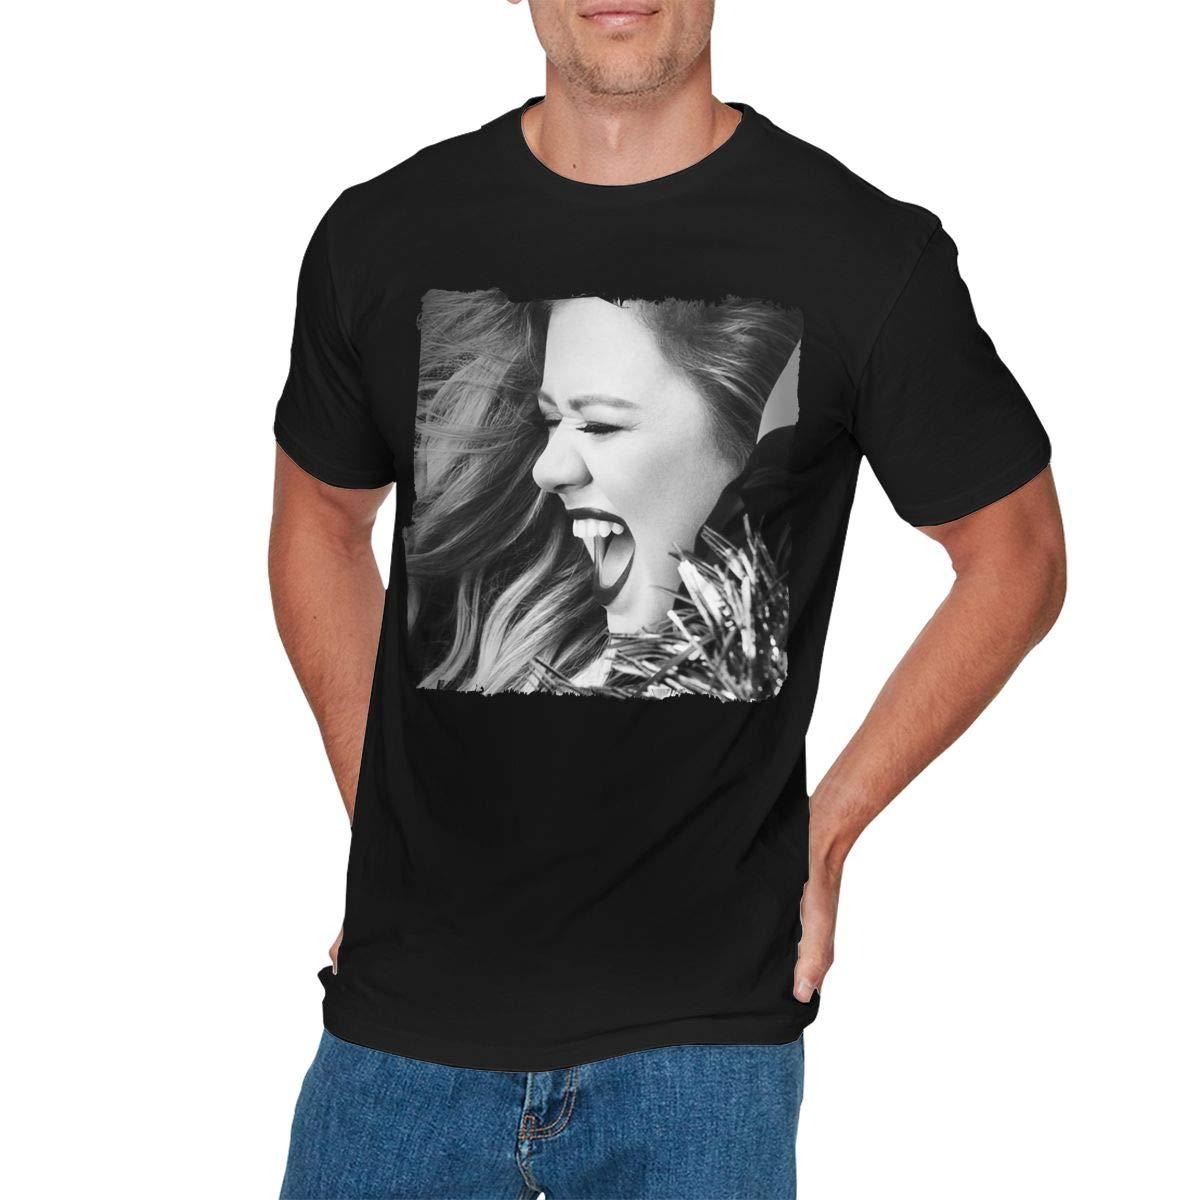 Peterjpan S Funny Kelly Clarkson T-shirt Black